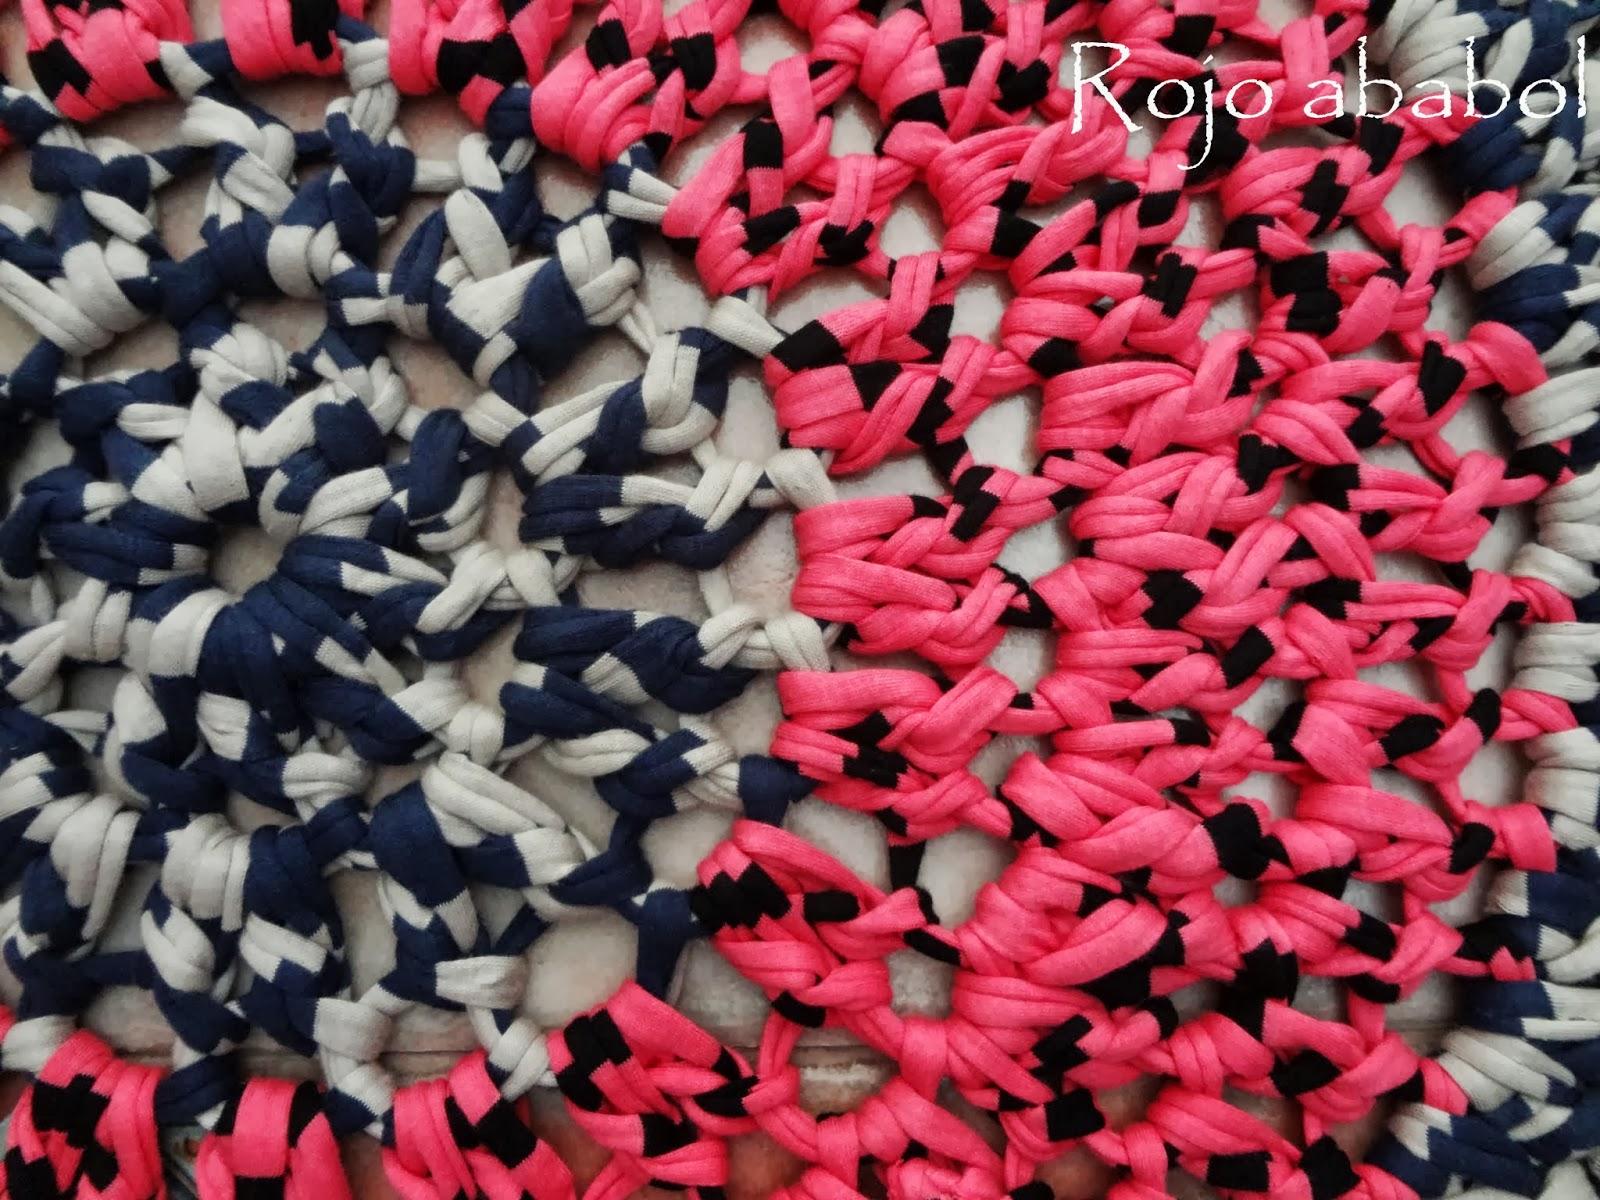 Rojo ababol alfombra de trapillo for Que significa alfombra